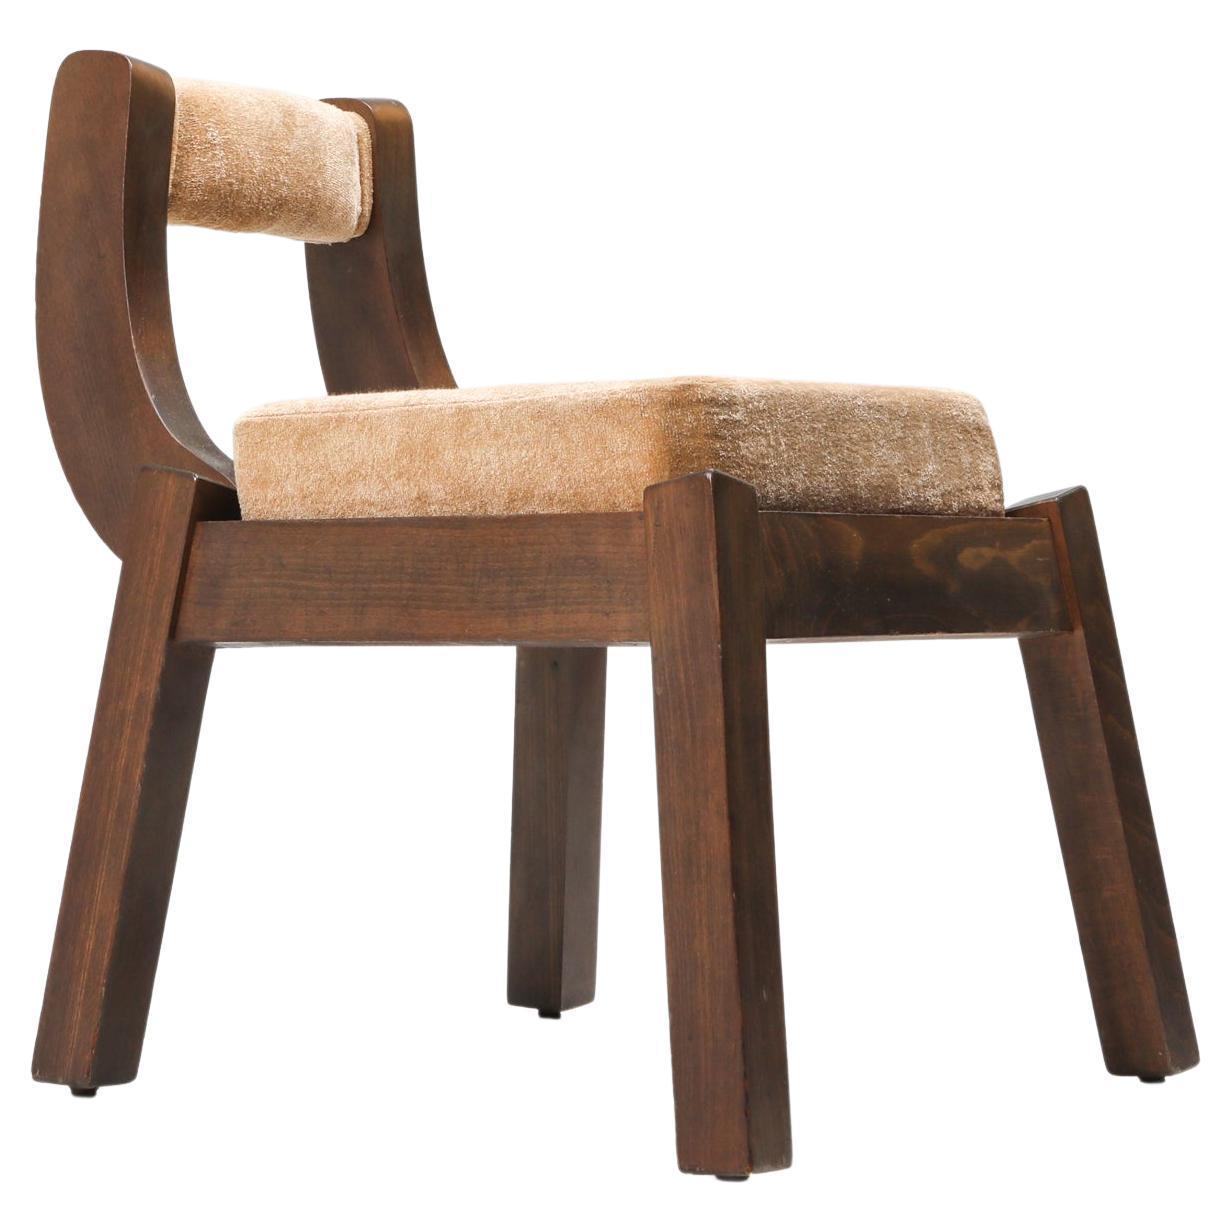 Borsani Italian Walnut Dining Chair, Art deco, Brutalism 1950's